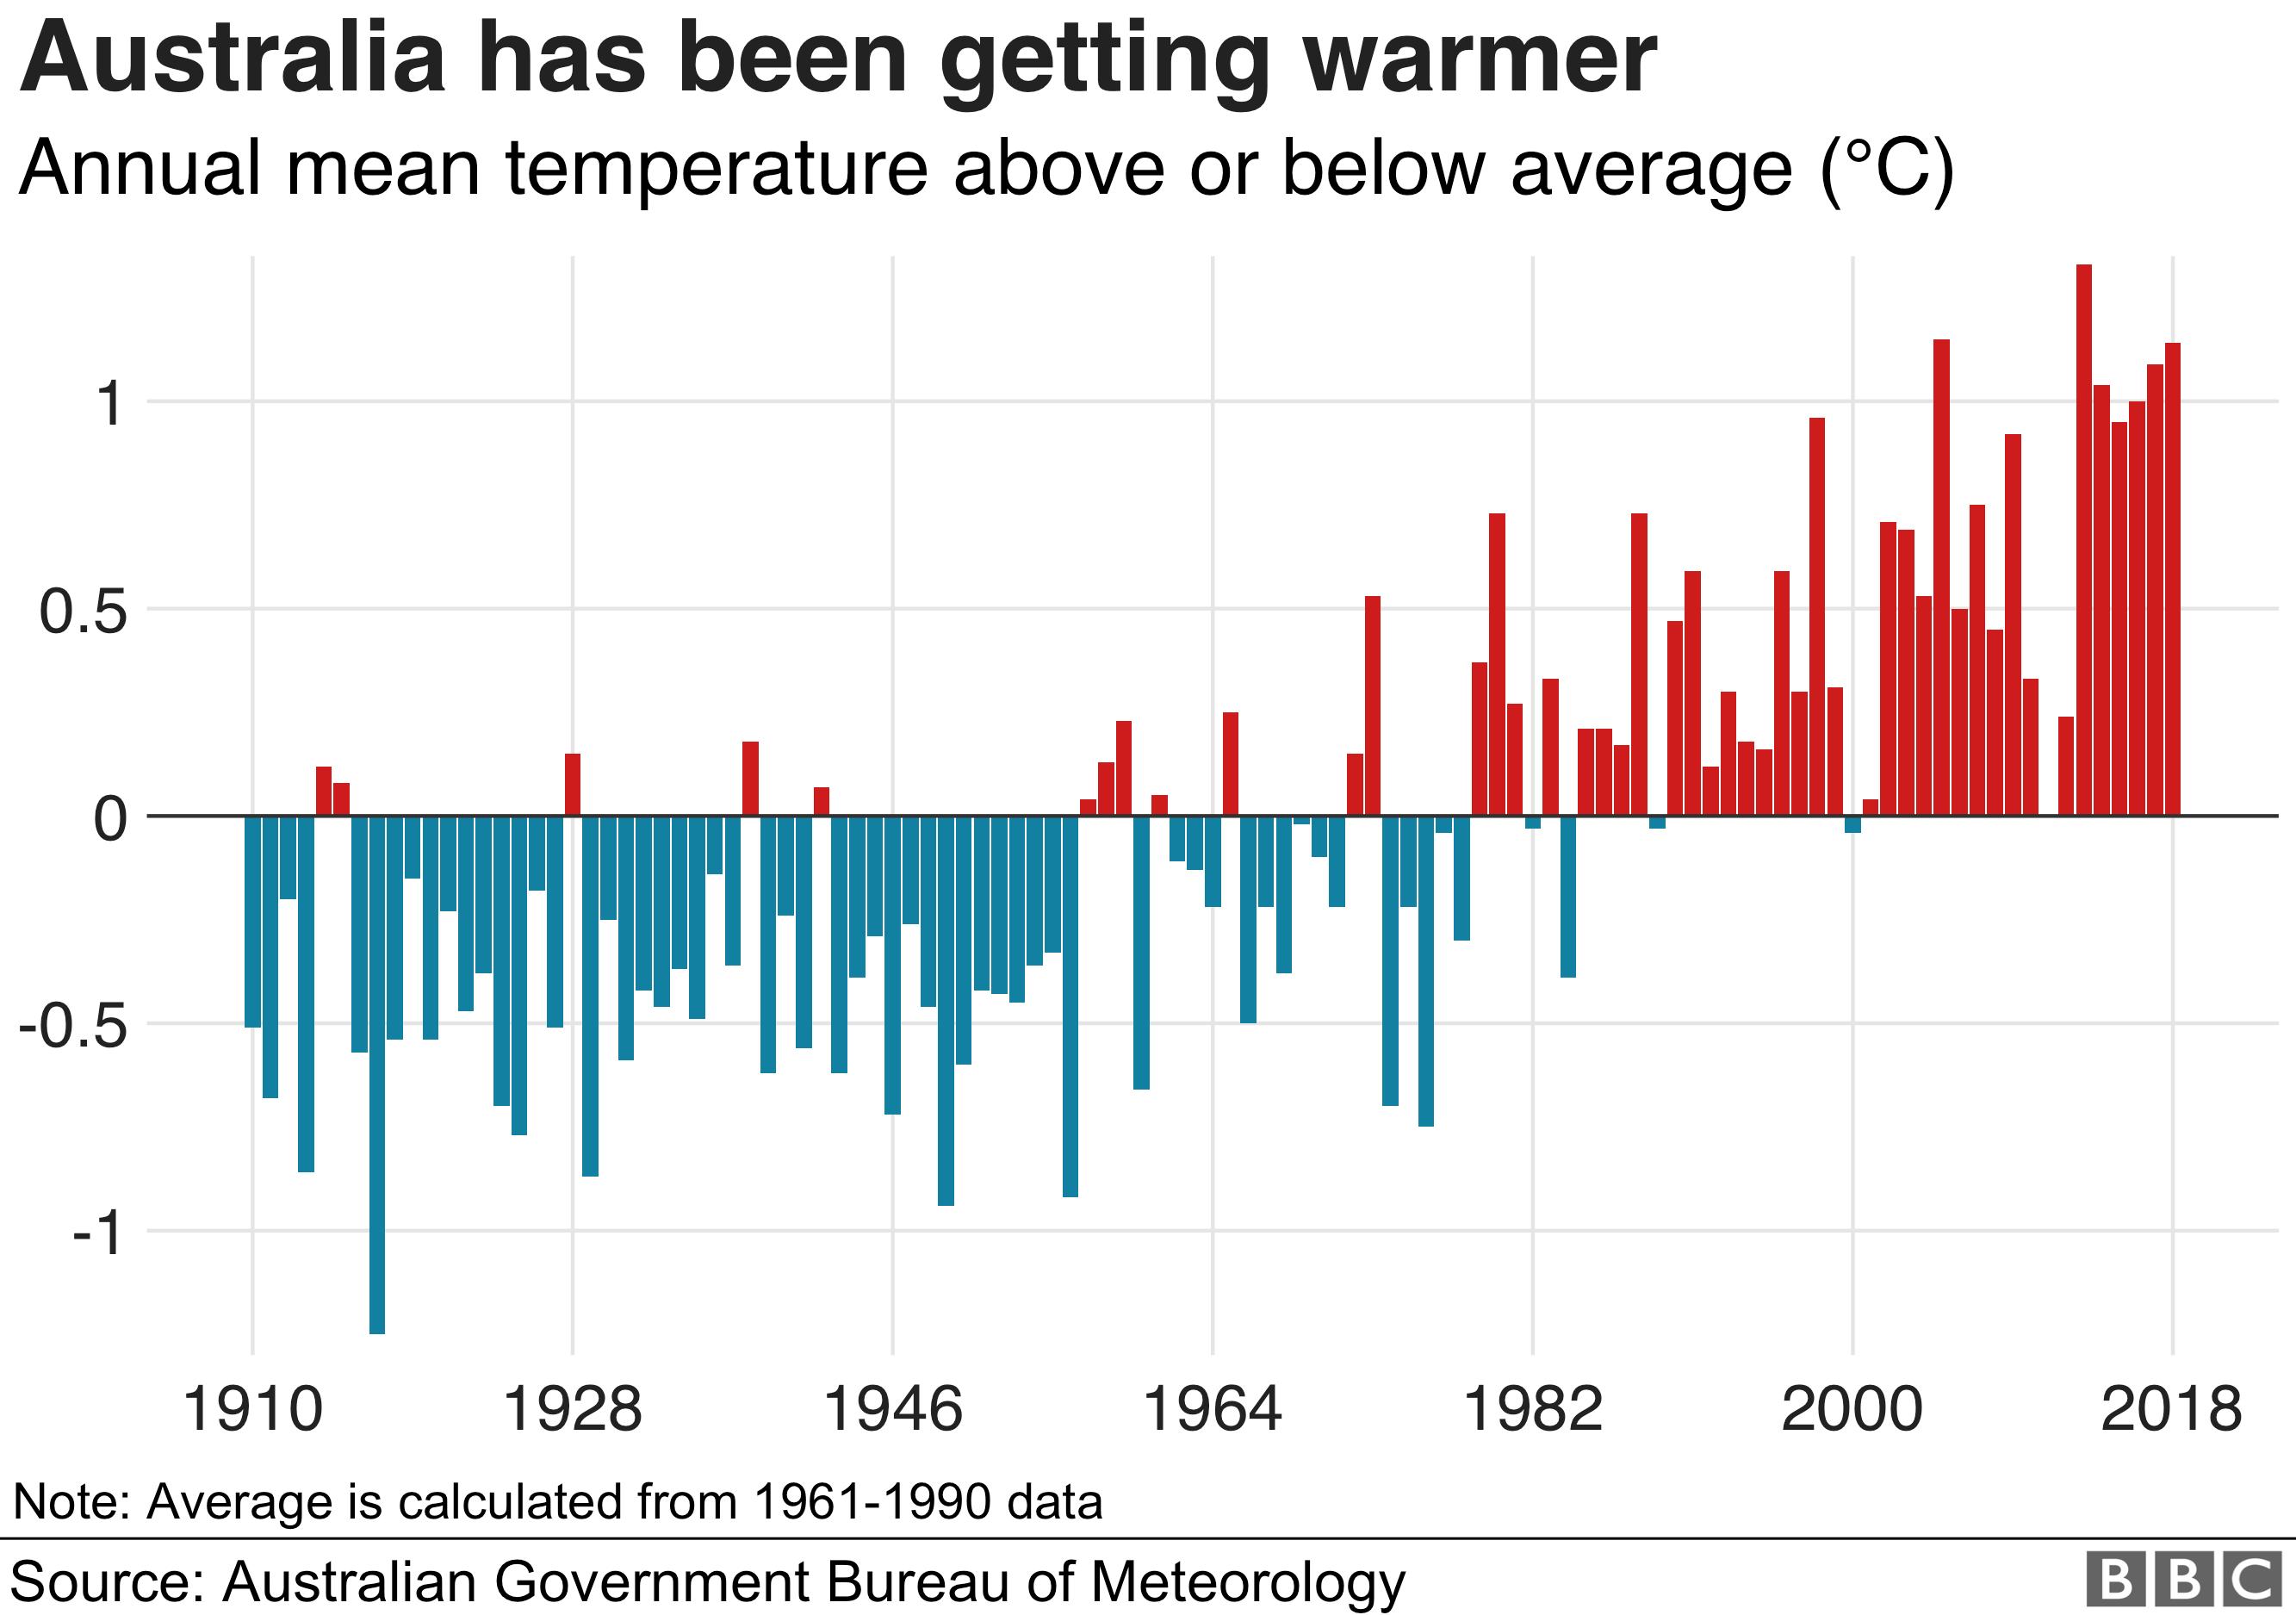 Australia experiences hottest summer on record - BBC News